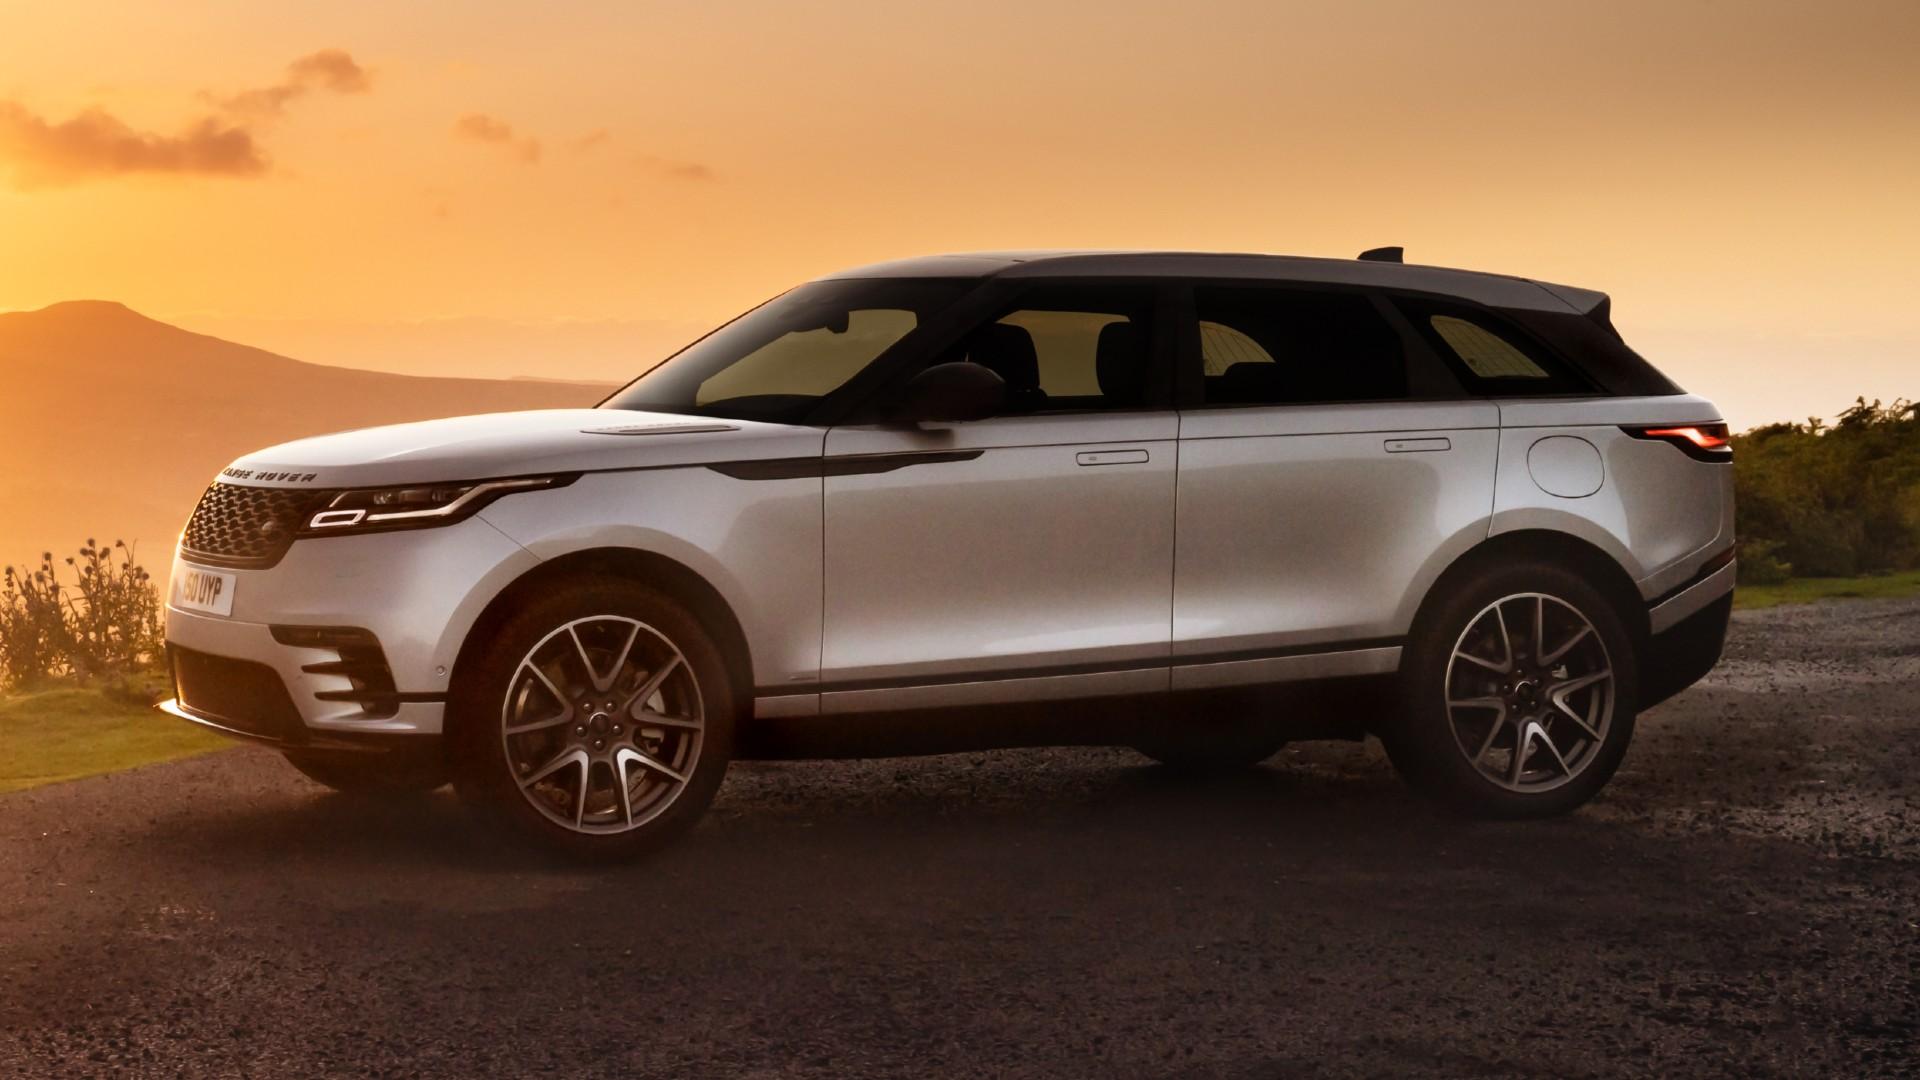 Jaguar Land Rover: Τα προβλήματα ποιότητας της κοστίζουν σε πωλήσεις